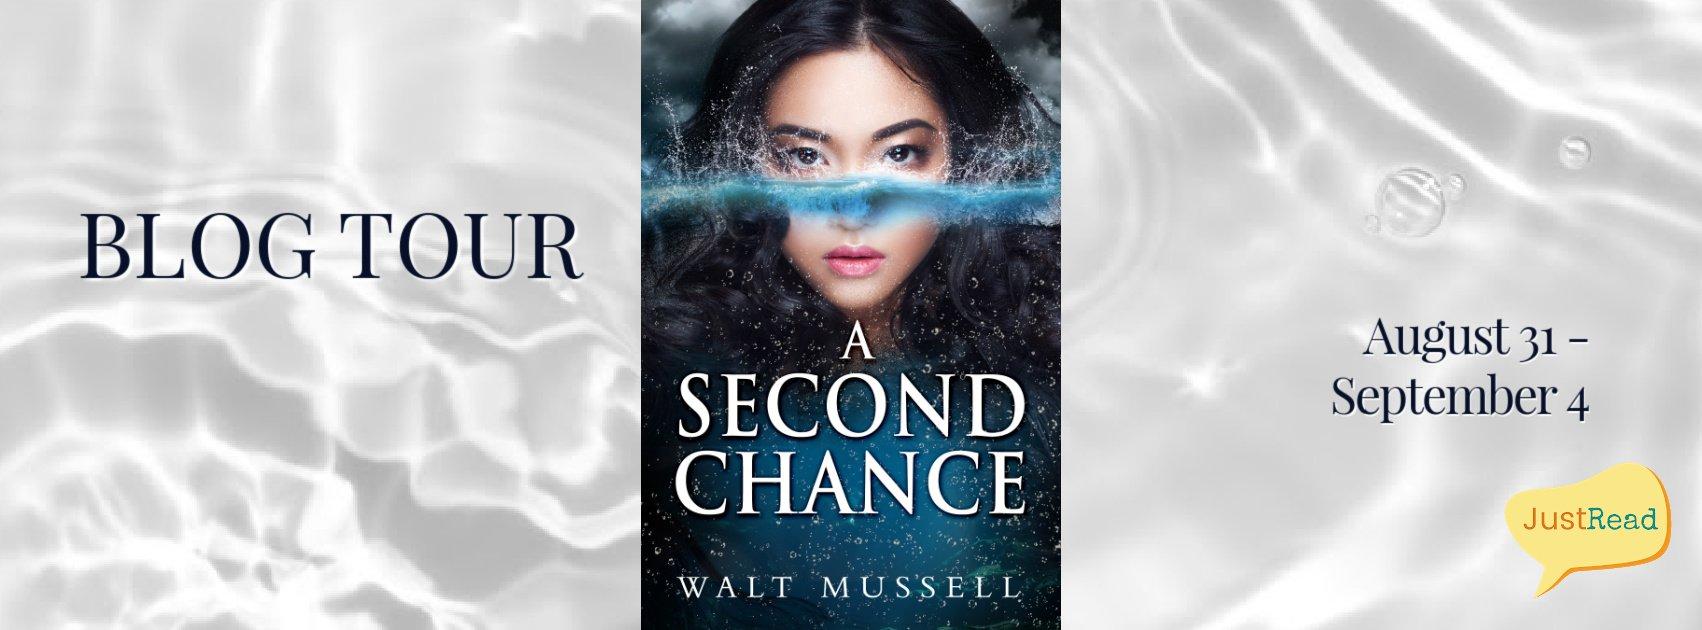 A Second Chance JustRead Blog Tour